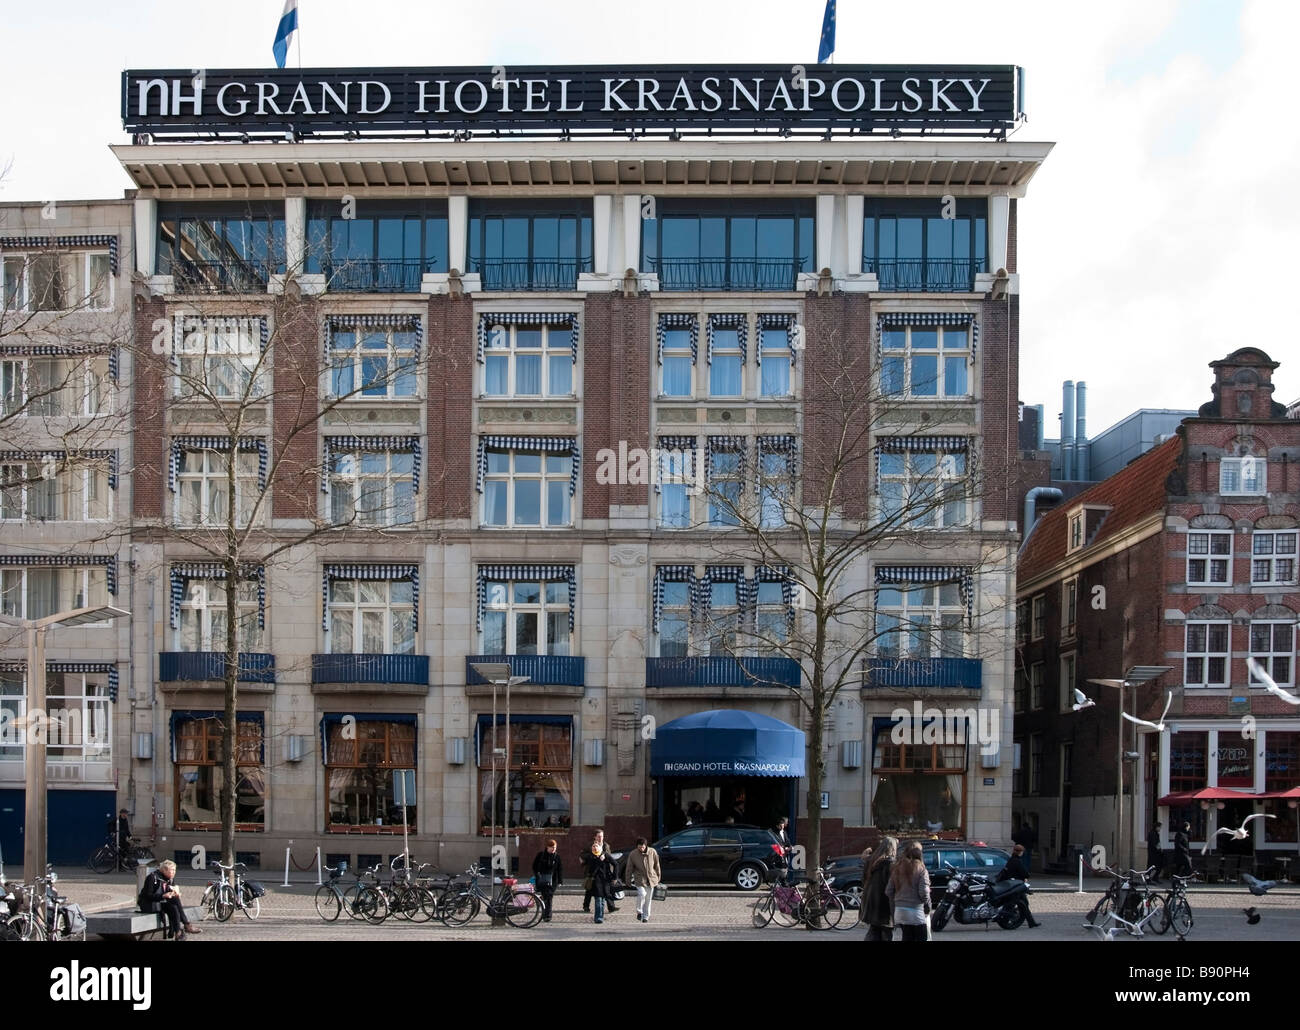 Nh Hotel Amsterdam Centrum